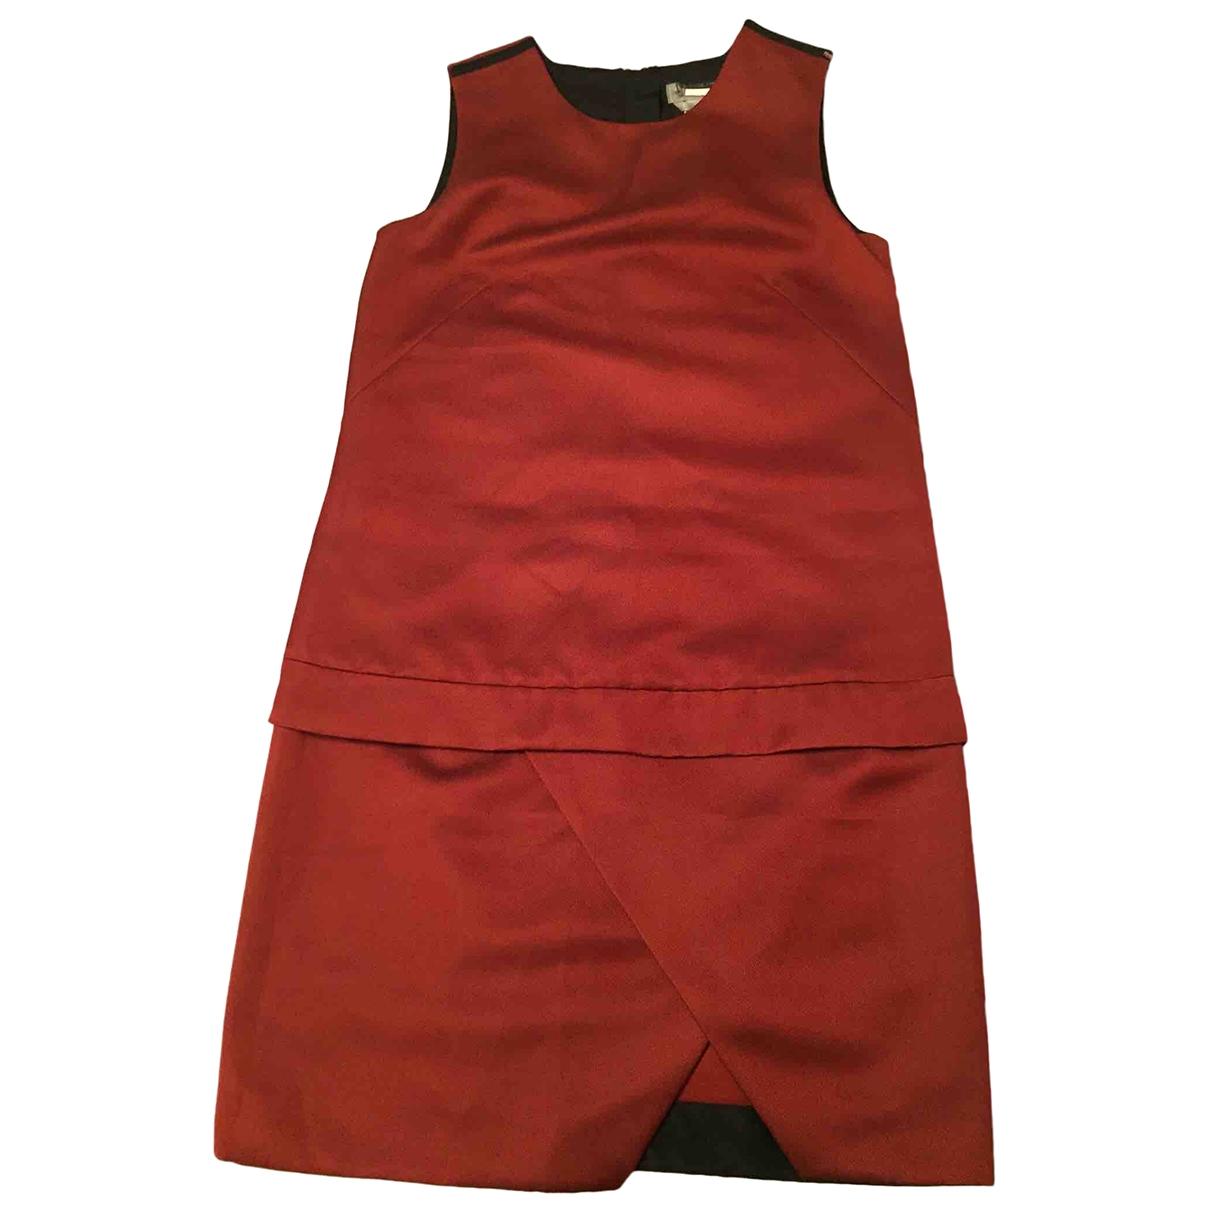 Sport Max \N Kleid in  Braun Polyester